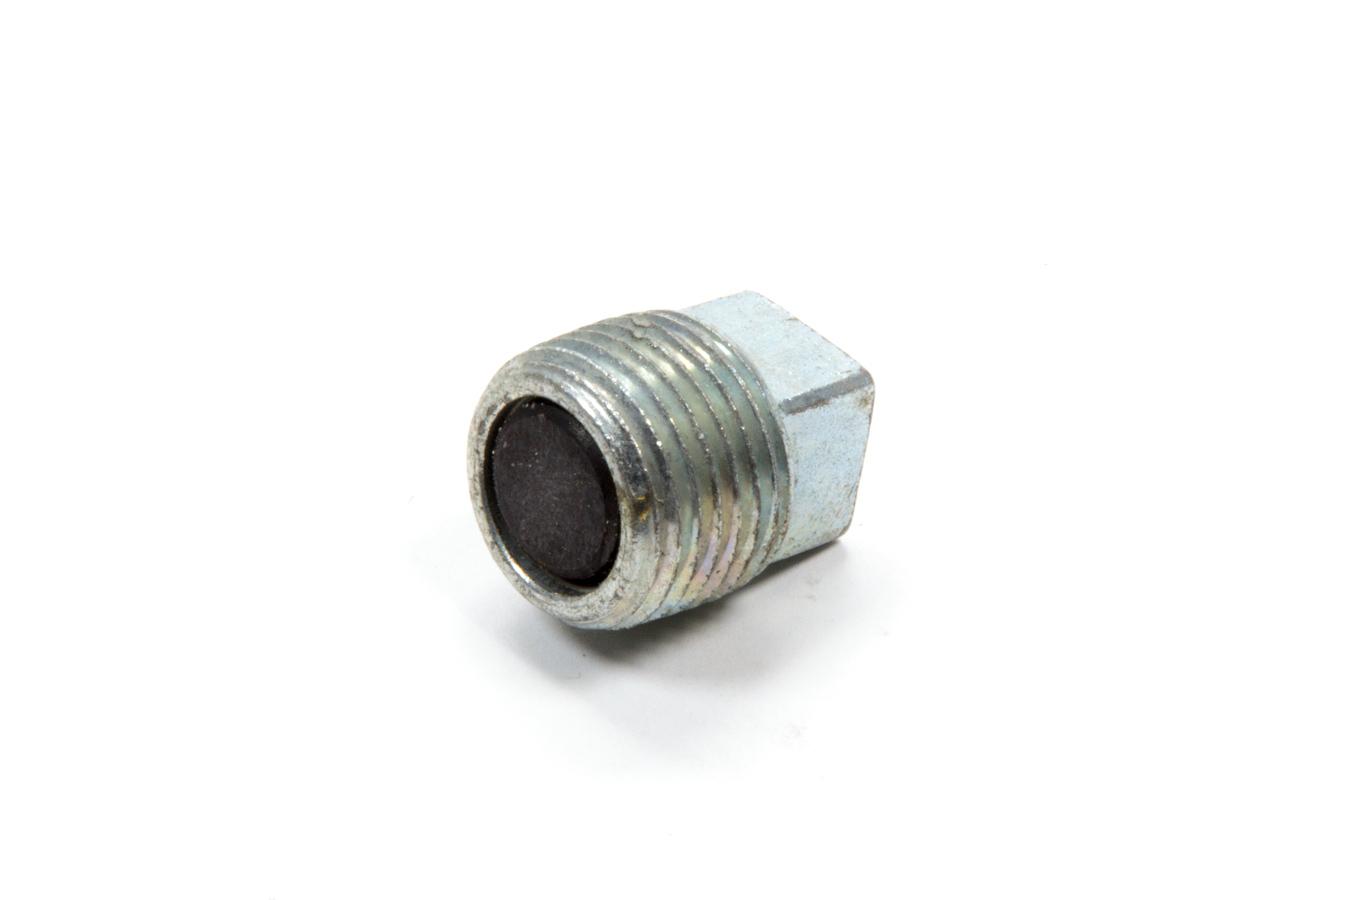 Bert Transmissions 72 Drain Plug, 1/2 in NPT, Square Head, Magnetic, Steel, Zinc Oxide, Bert Transmissions, Each